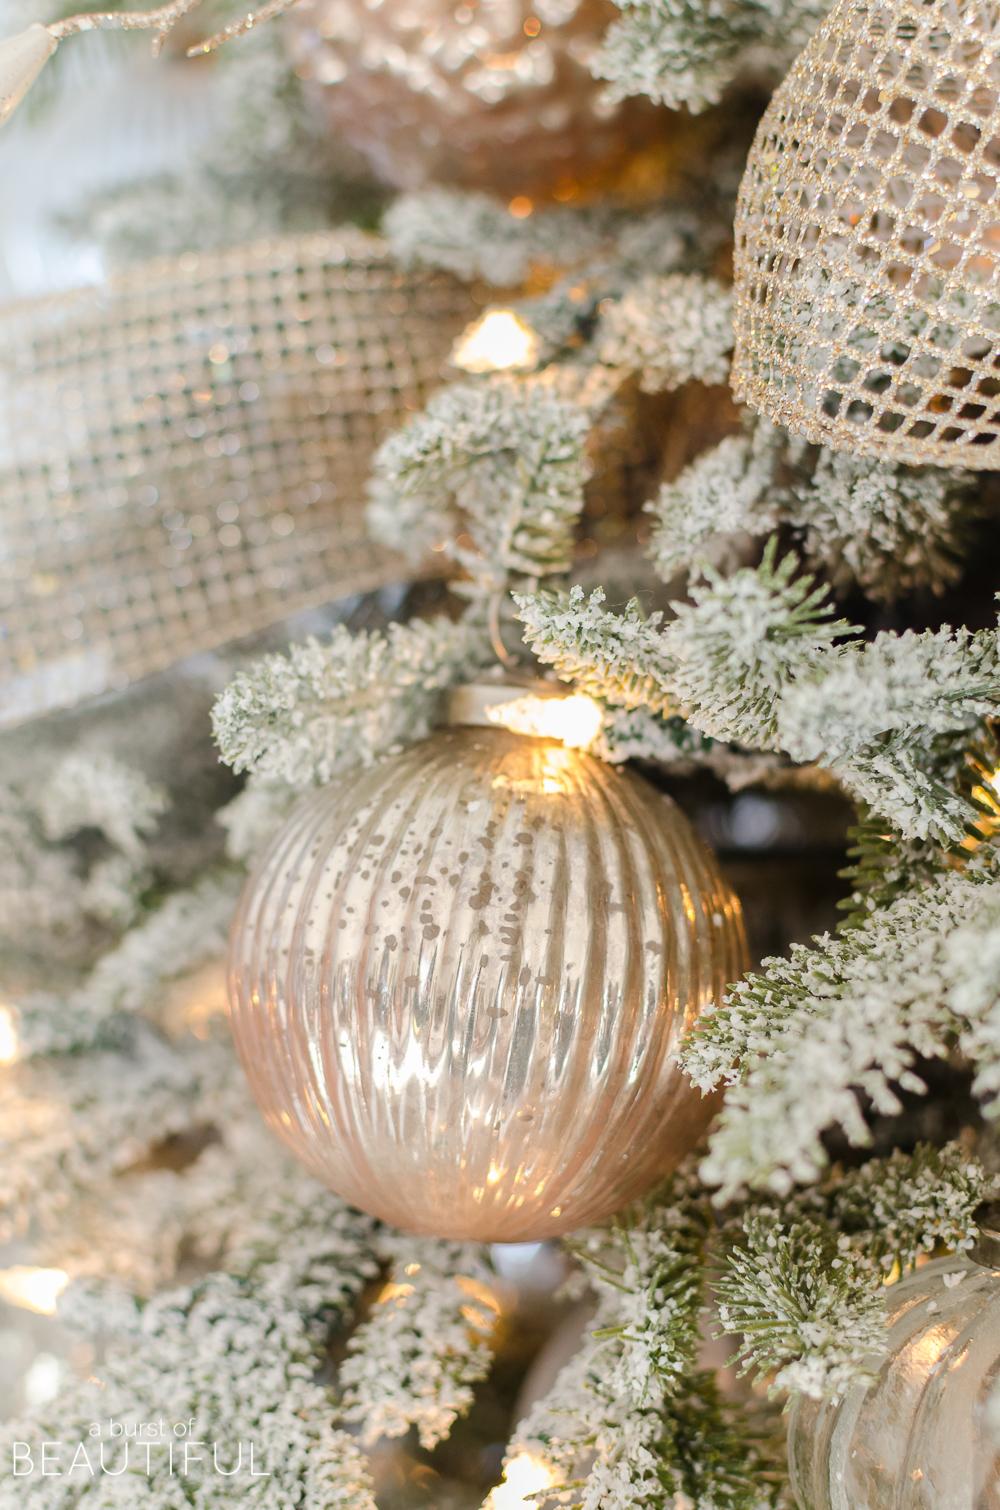 A-Snowy-Flocked-Christmas-Tree-4932.jpg